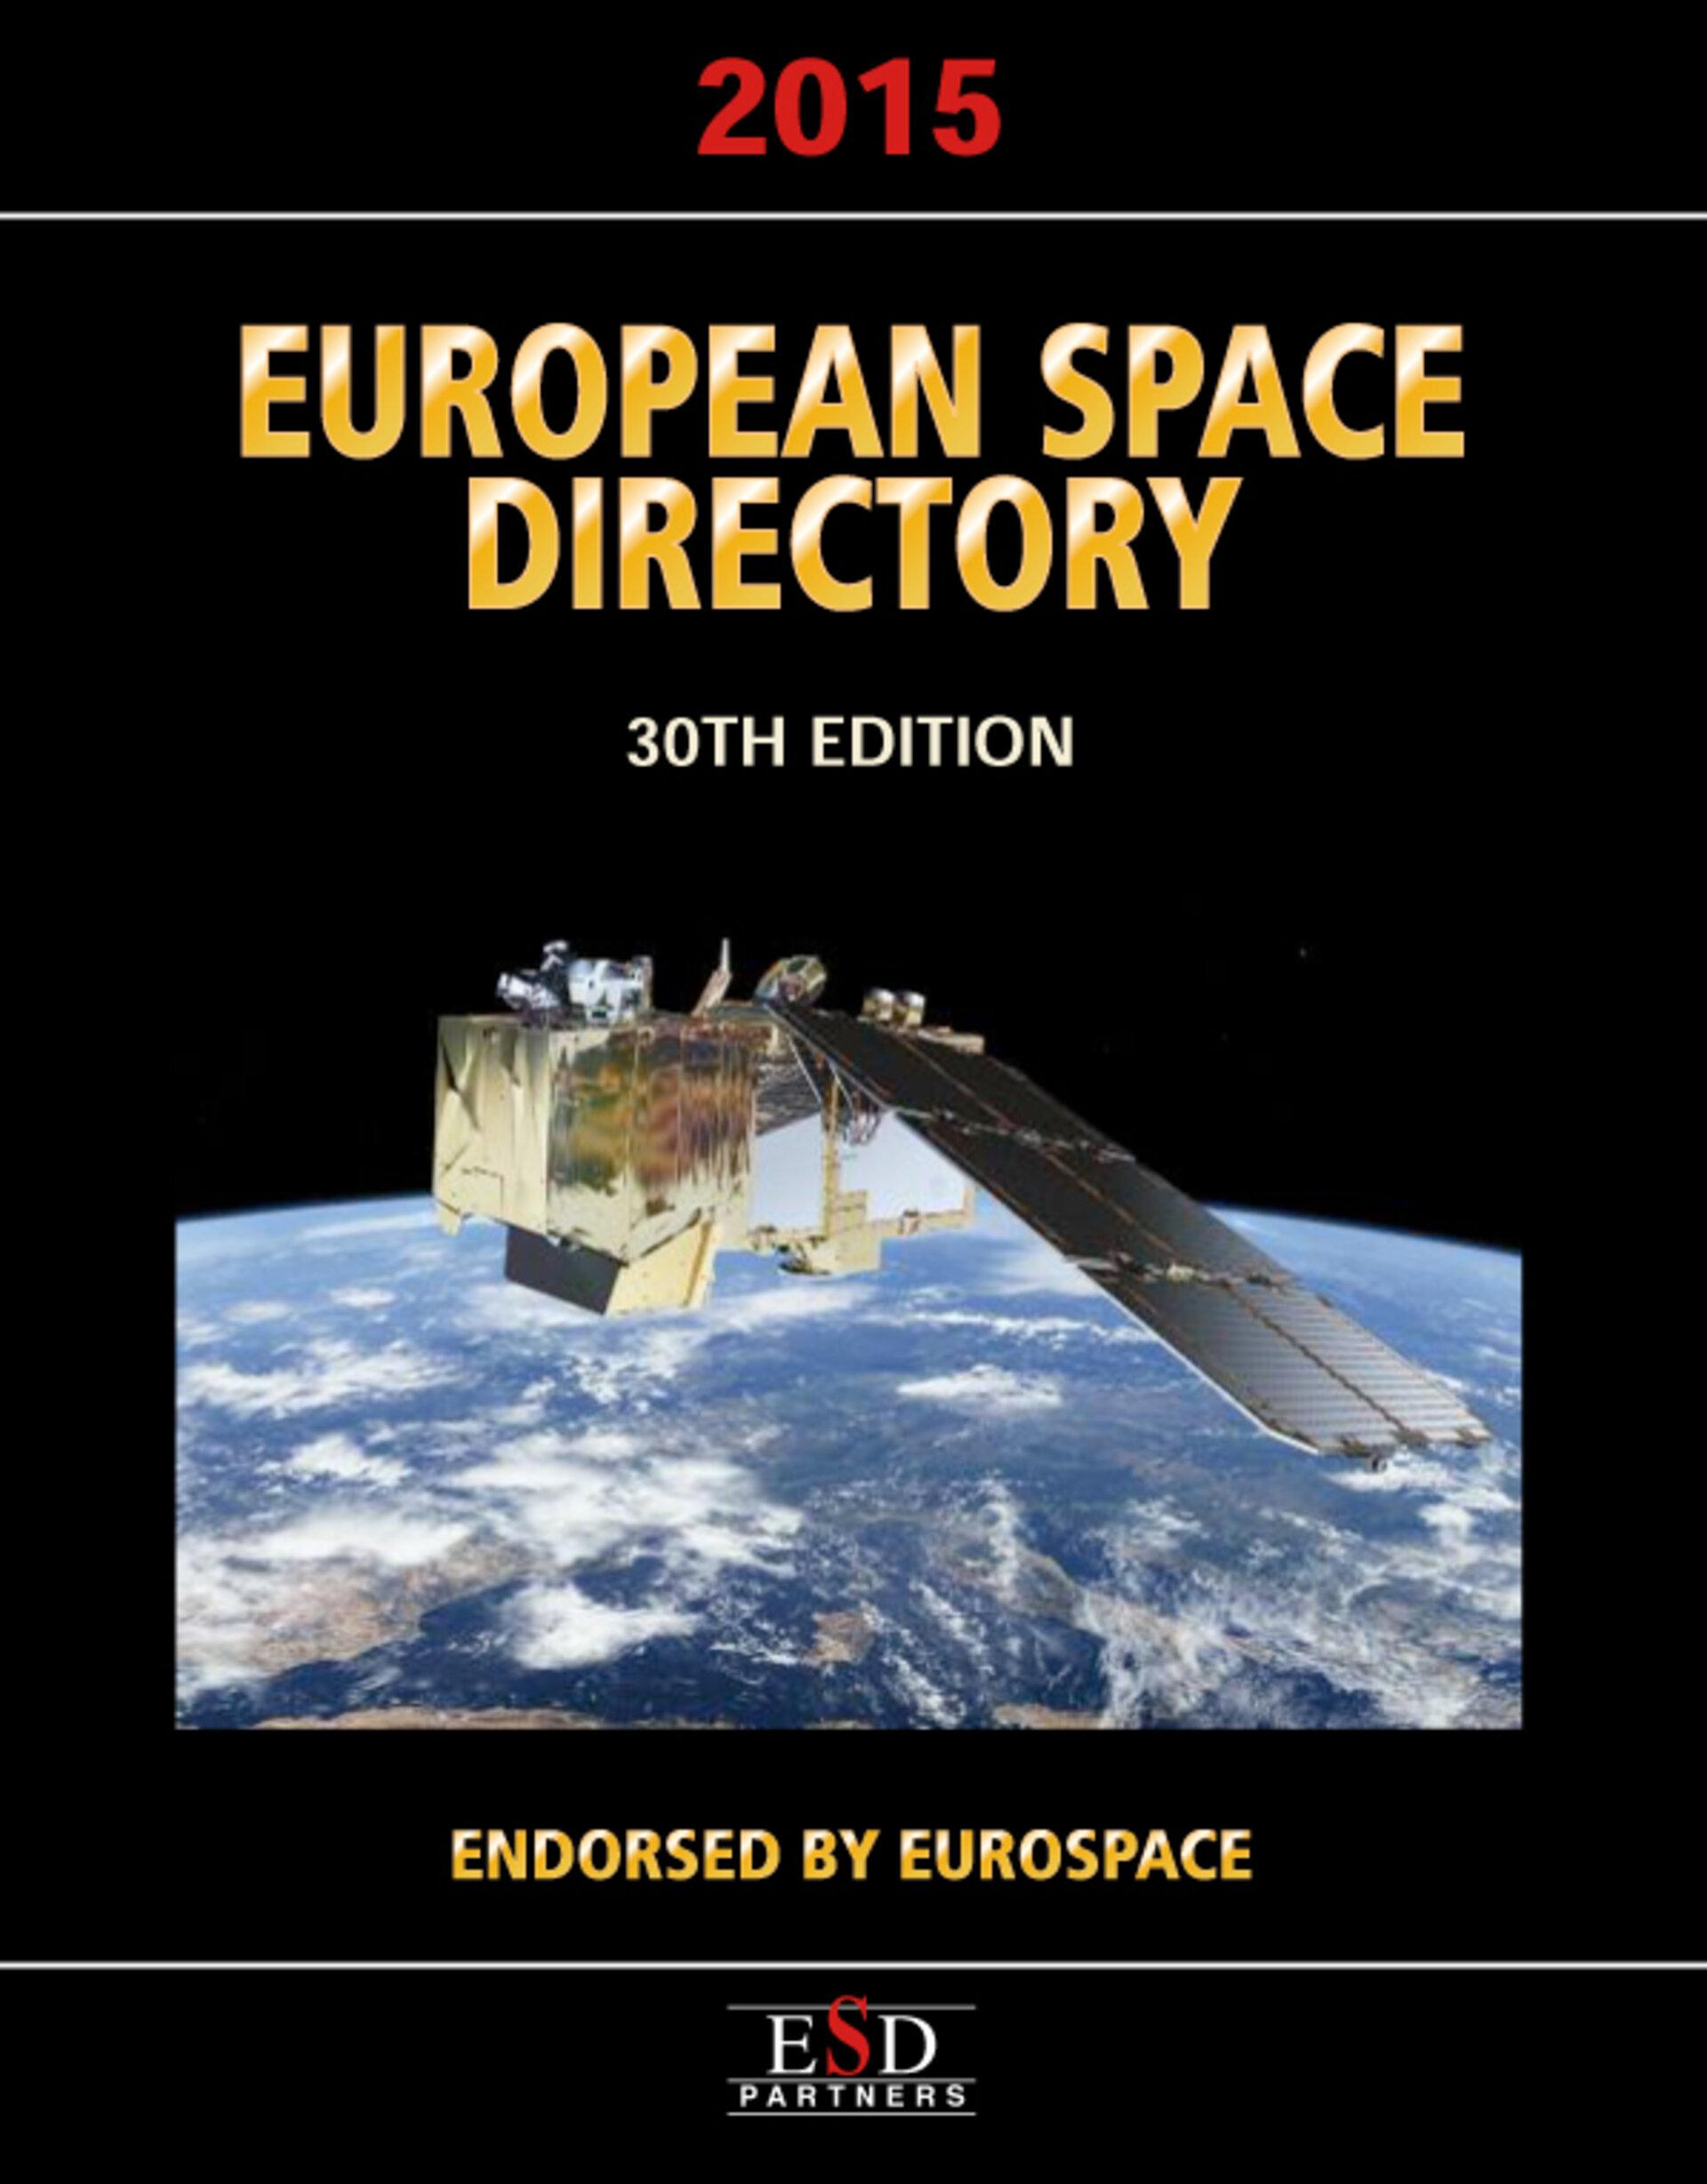 Via Satellites 2005 Satellite Industry Directory